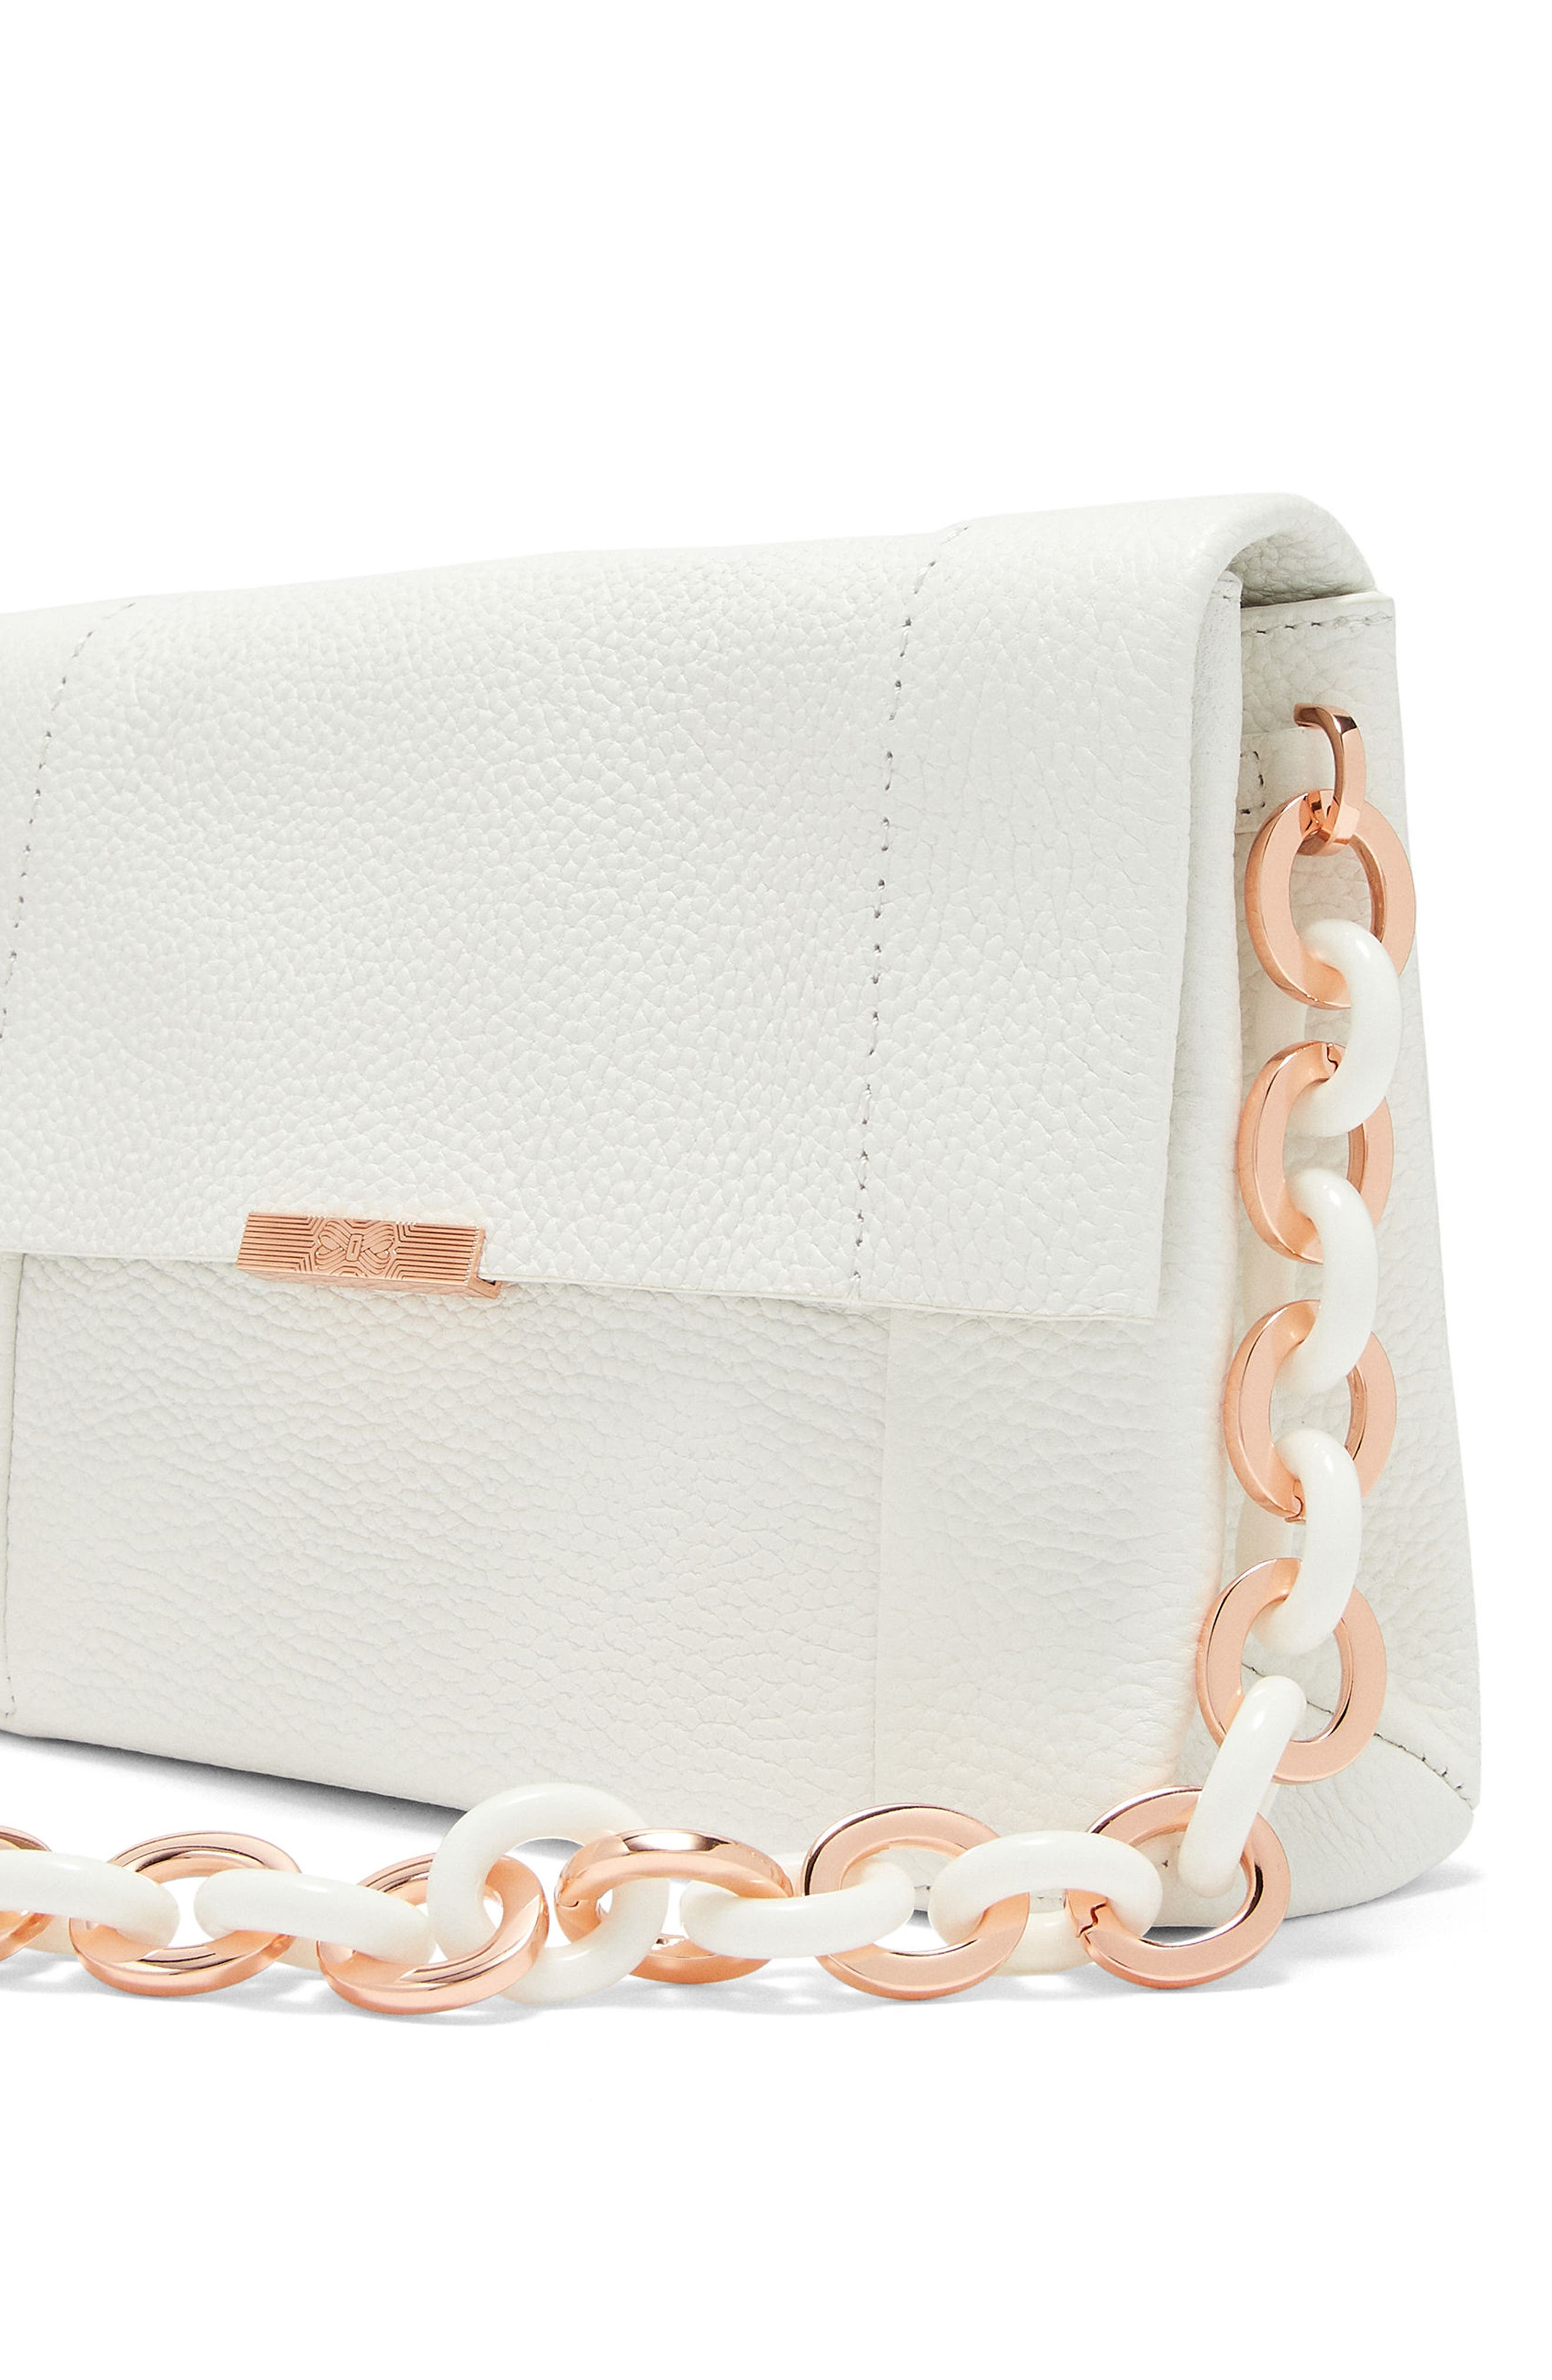 Ipomoea Leather Shoulder Bag,                             Alternate thumbnail 11, color,